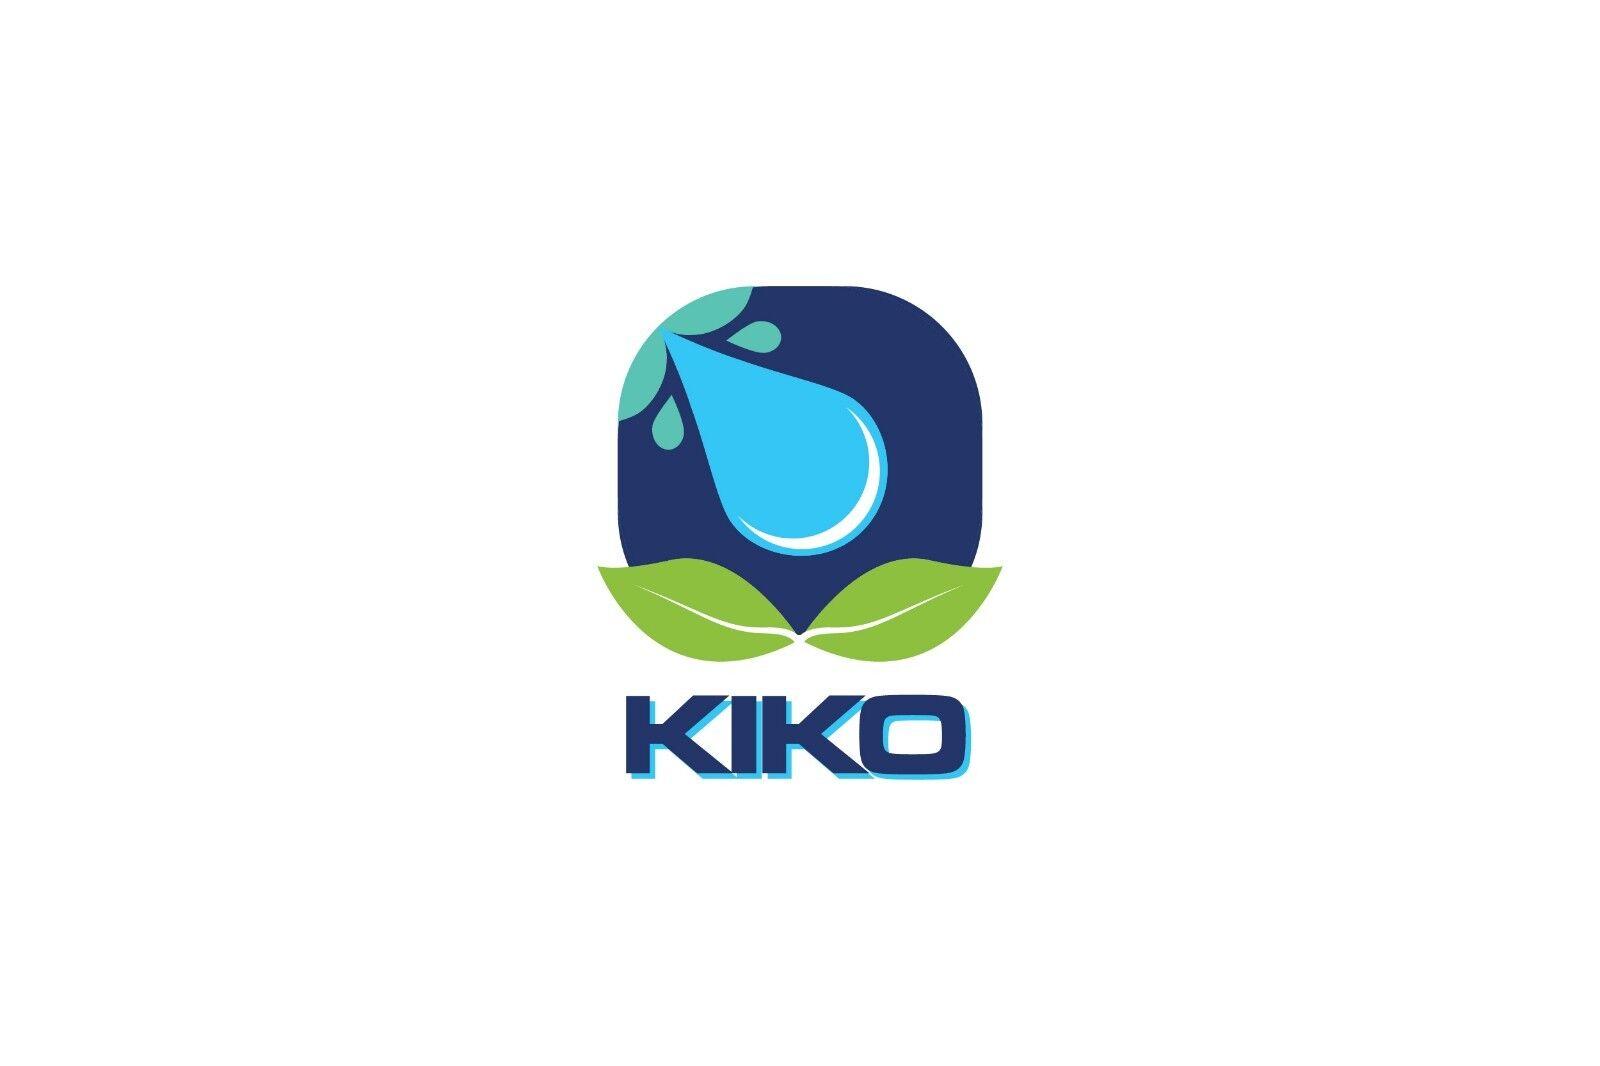 KIKO Q-7700 Elongated Toilet Bidet Seat 55 Functions with Heated Seat n Dryer